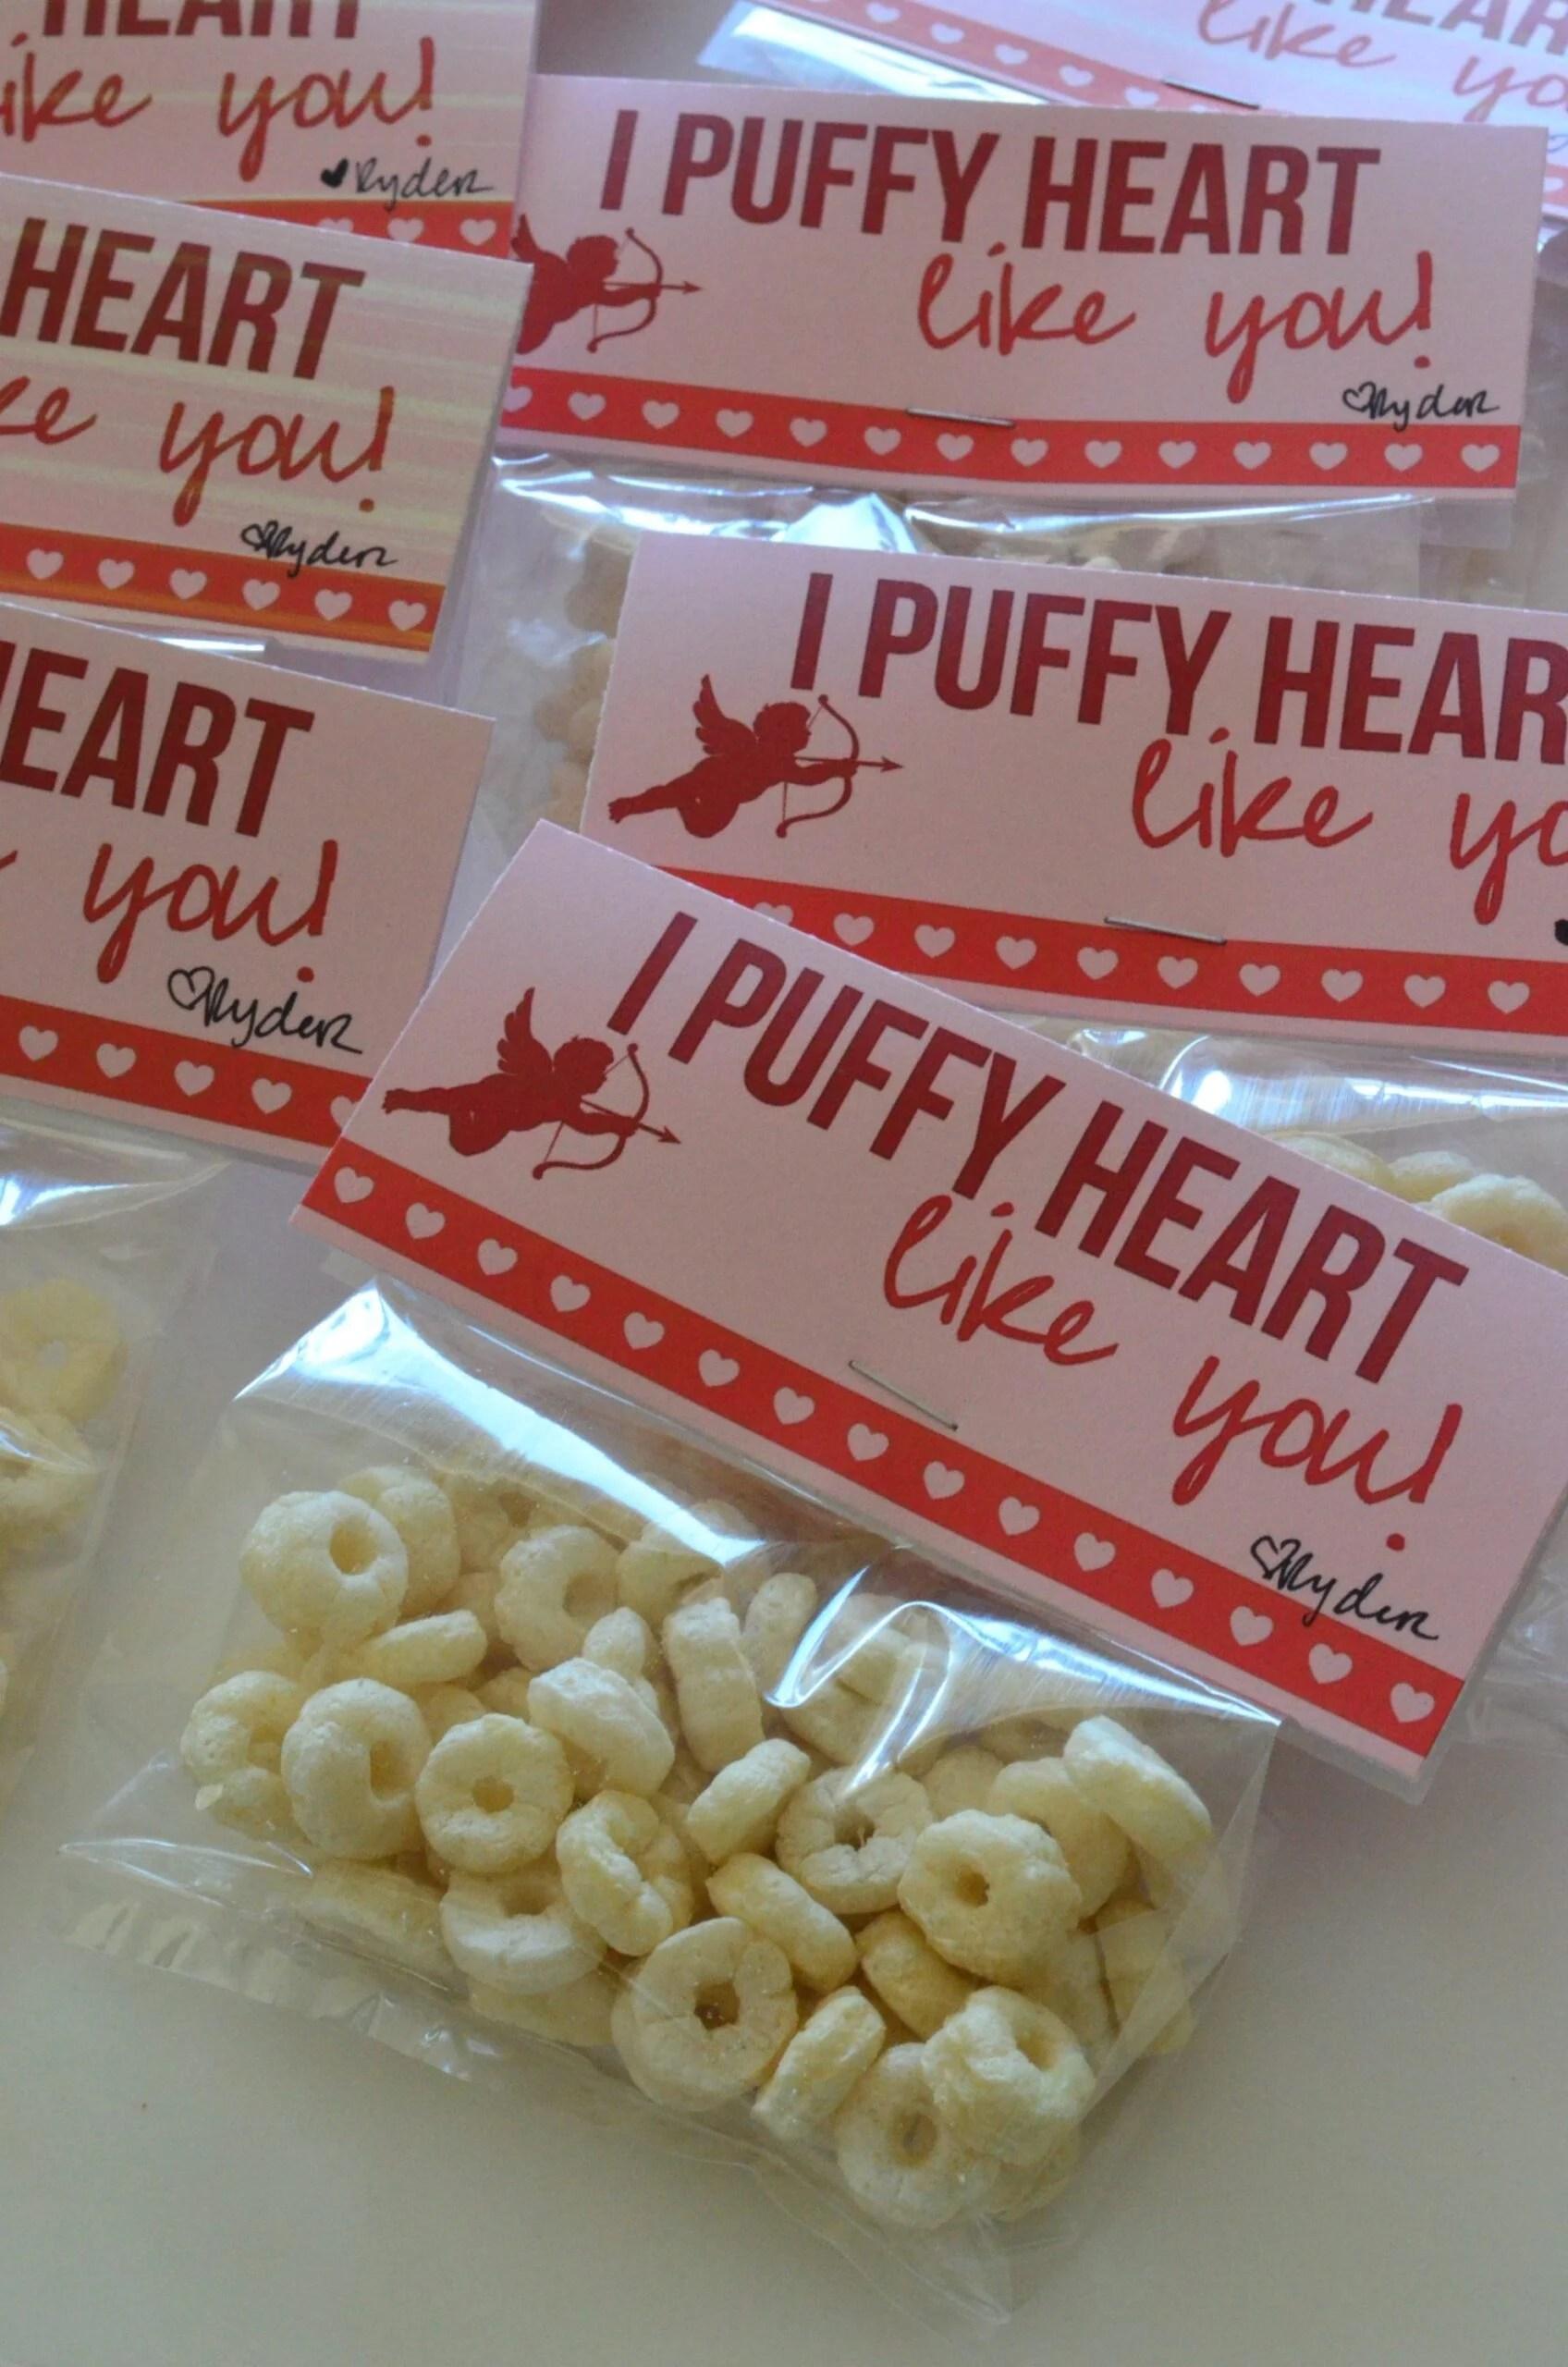 I puffy heart like you - Free Printable Baby Valentine